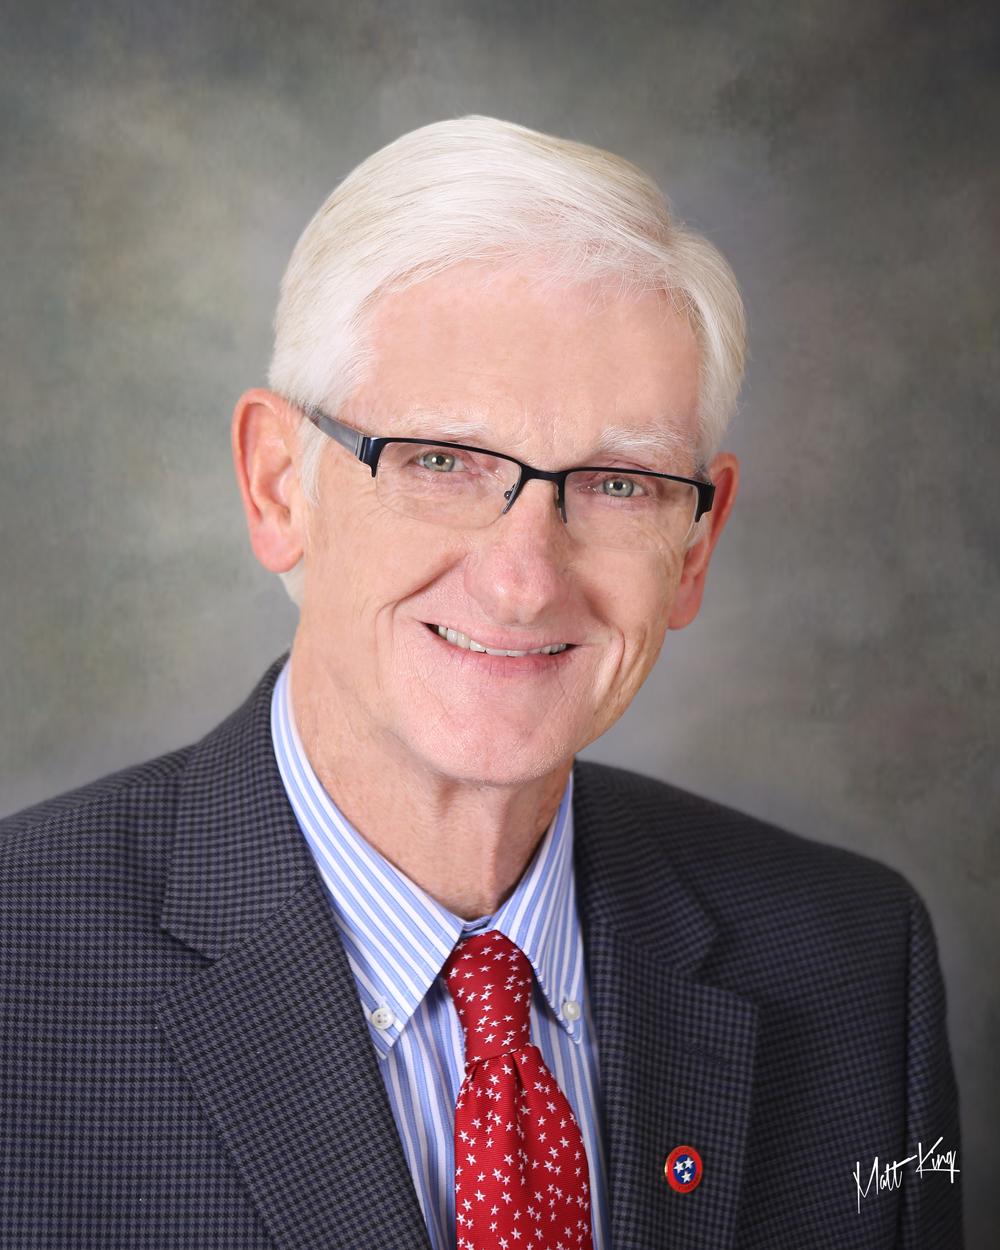 Dwayne Cole, Mayor of Munford